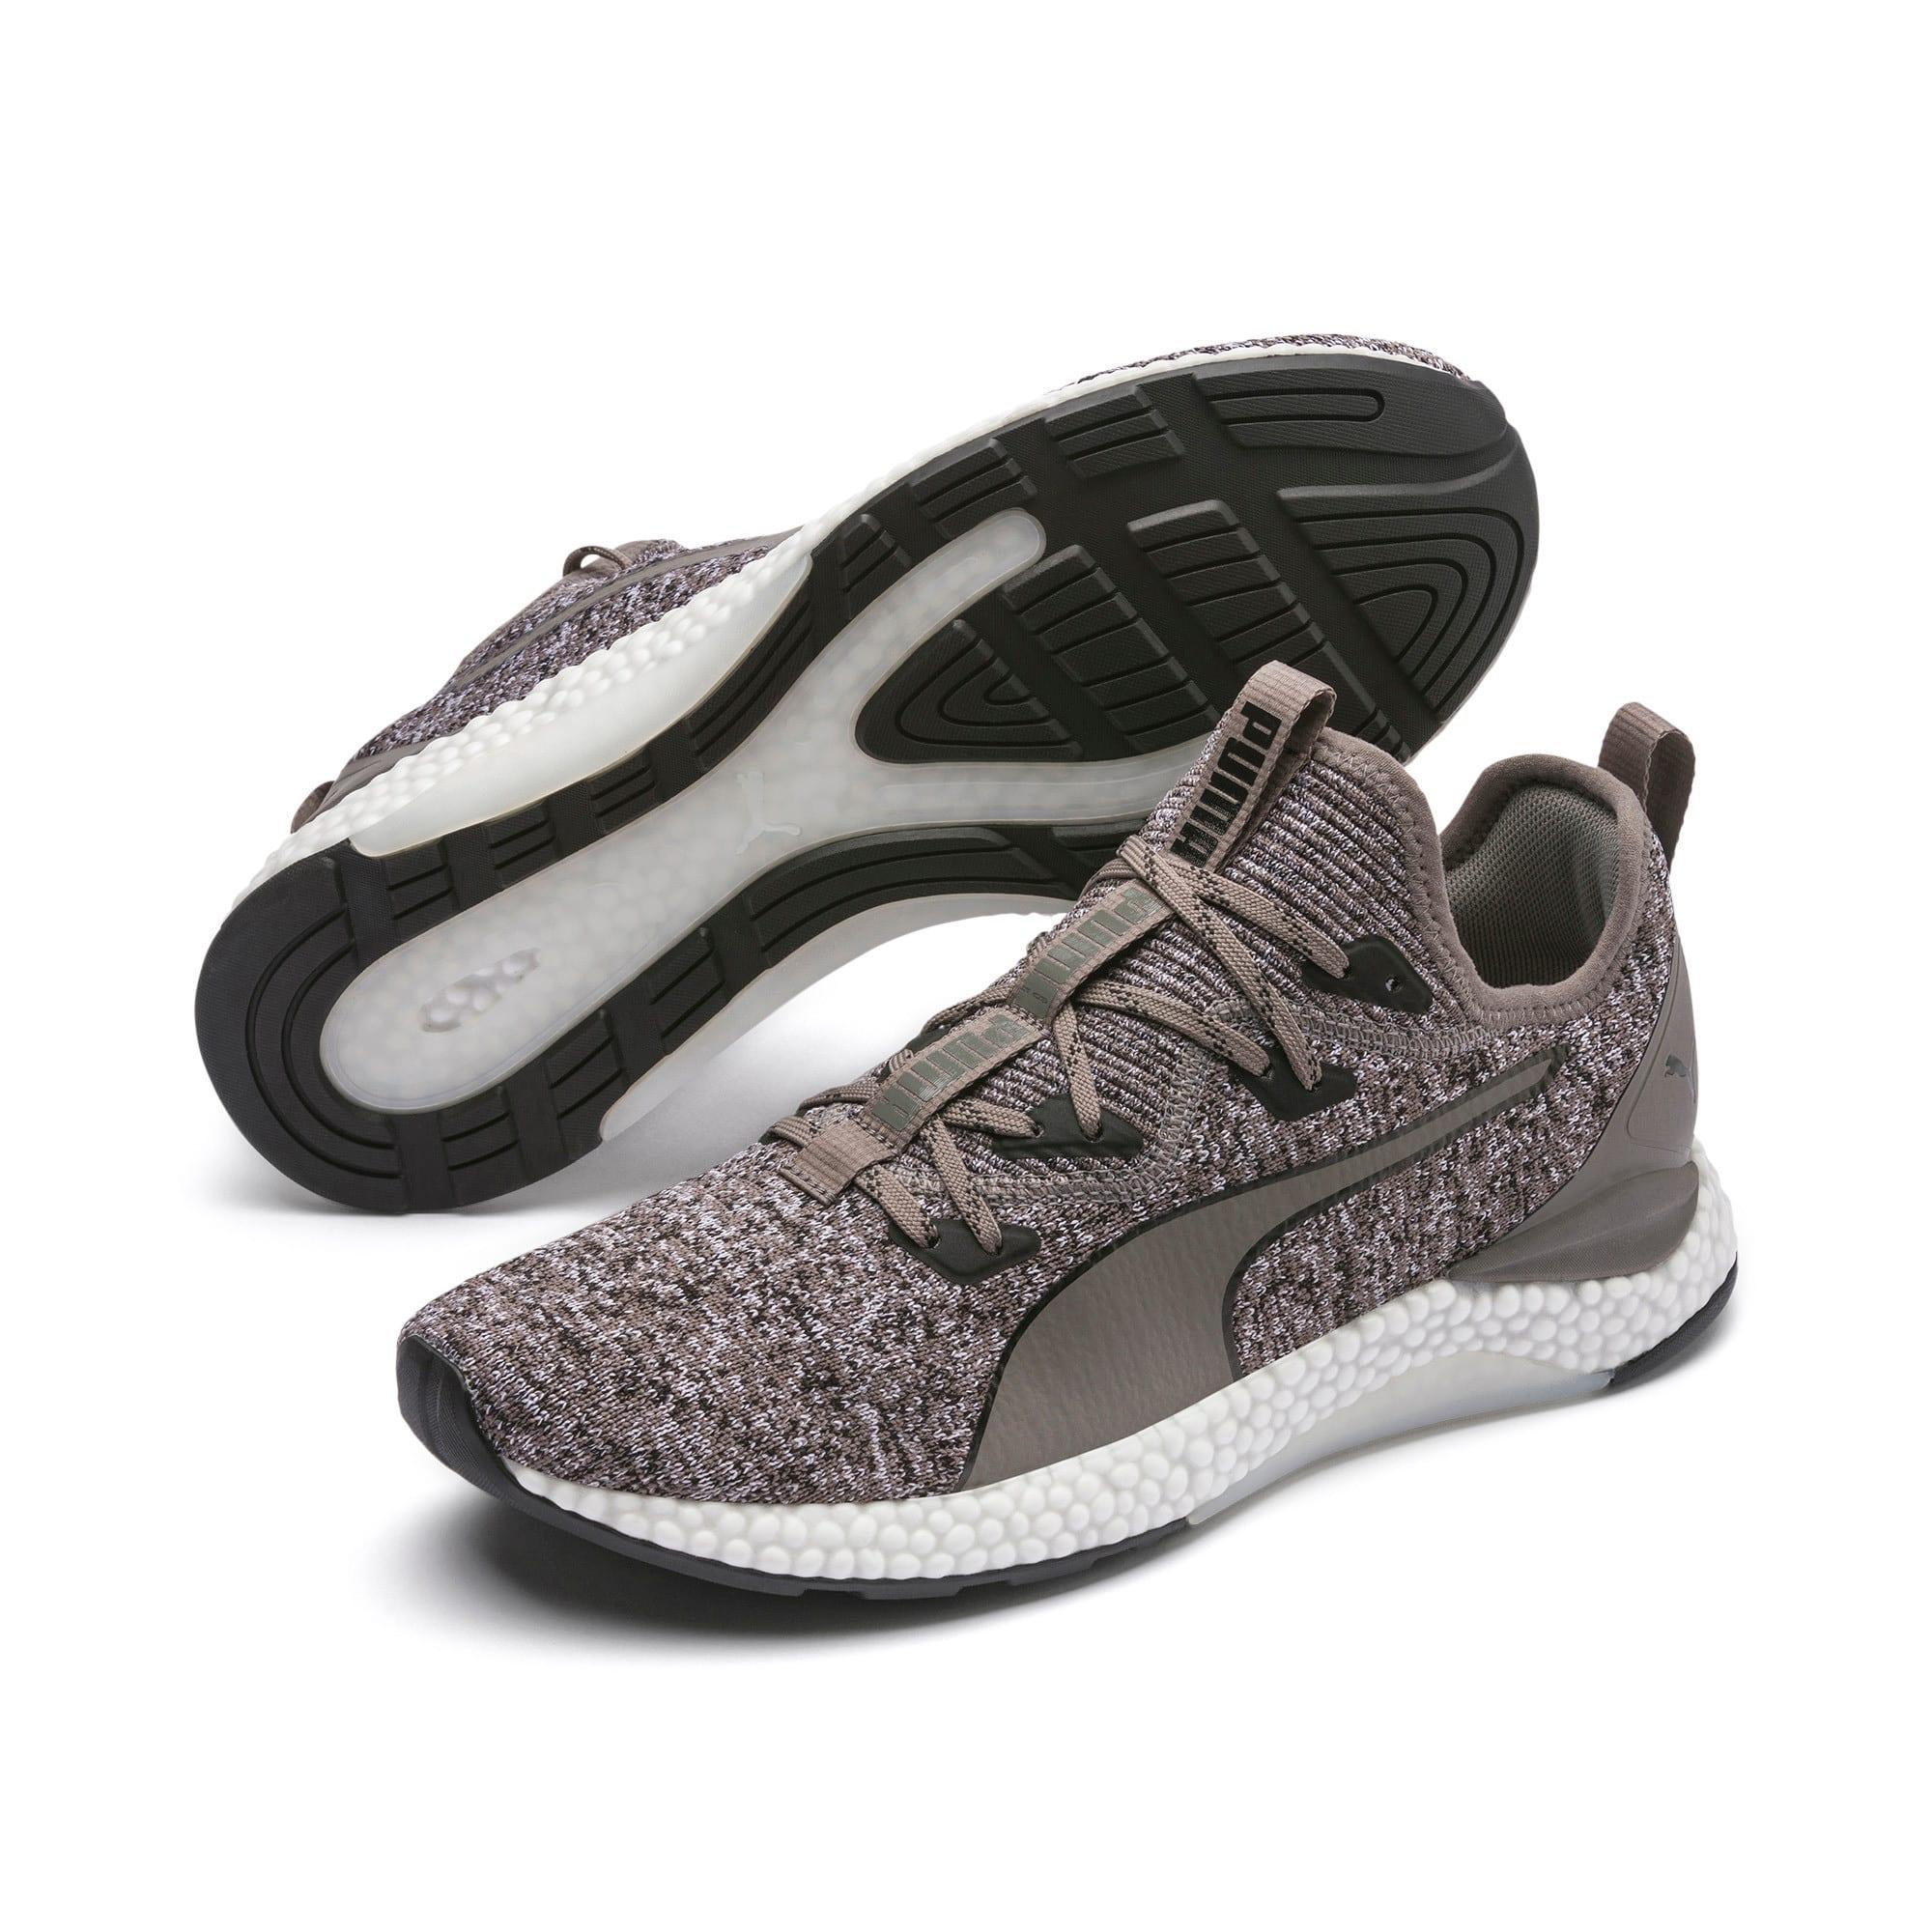 Thumbnail 3 of Hybrid Runner Men's Running Shoes, Charcoal Gray-Puma White, medium-IND